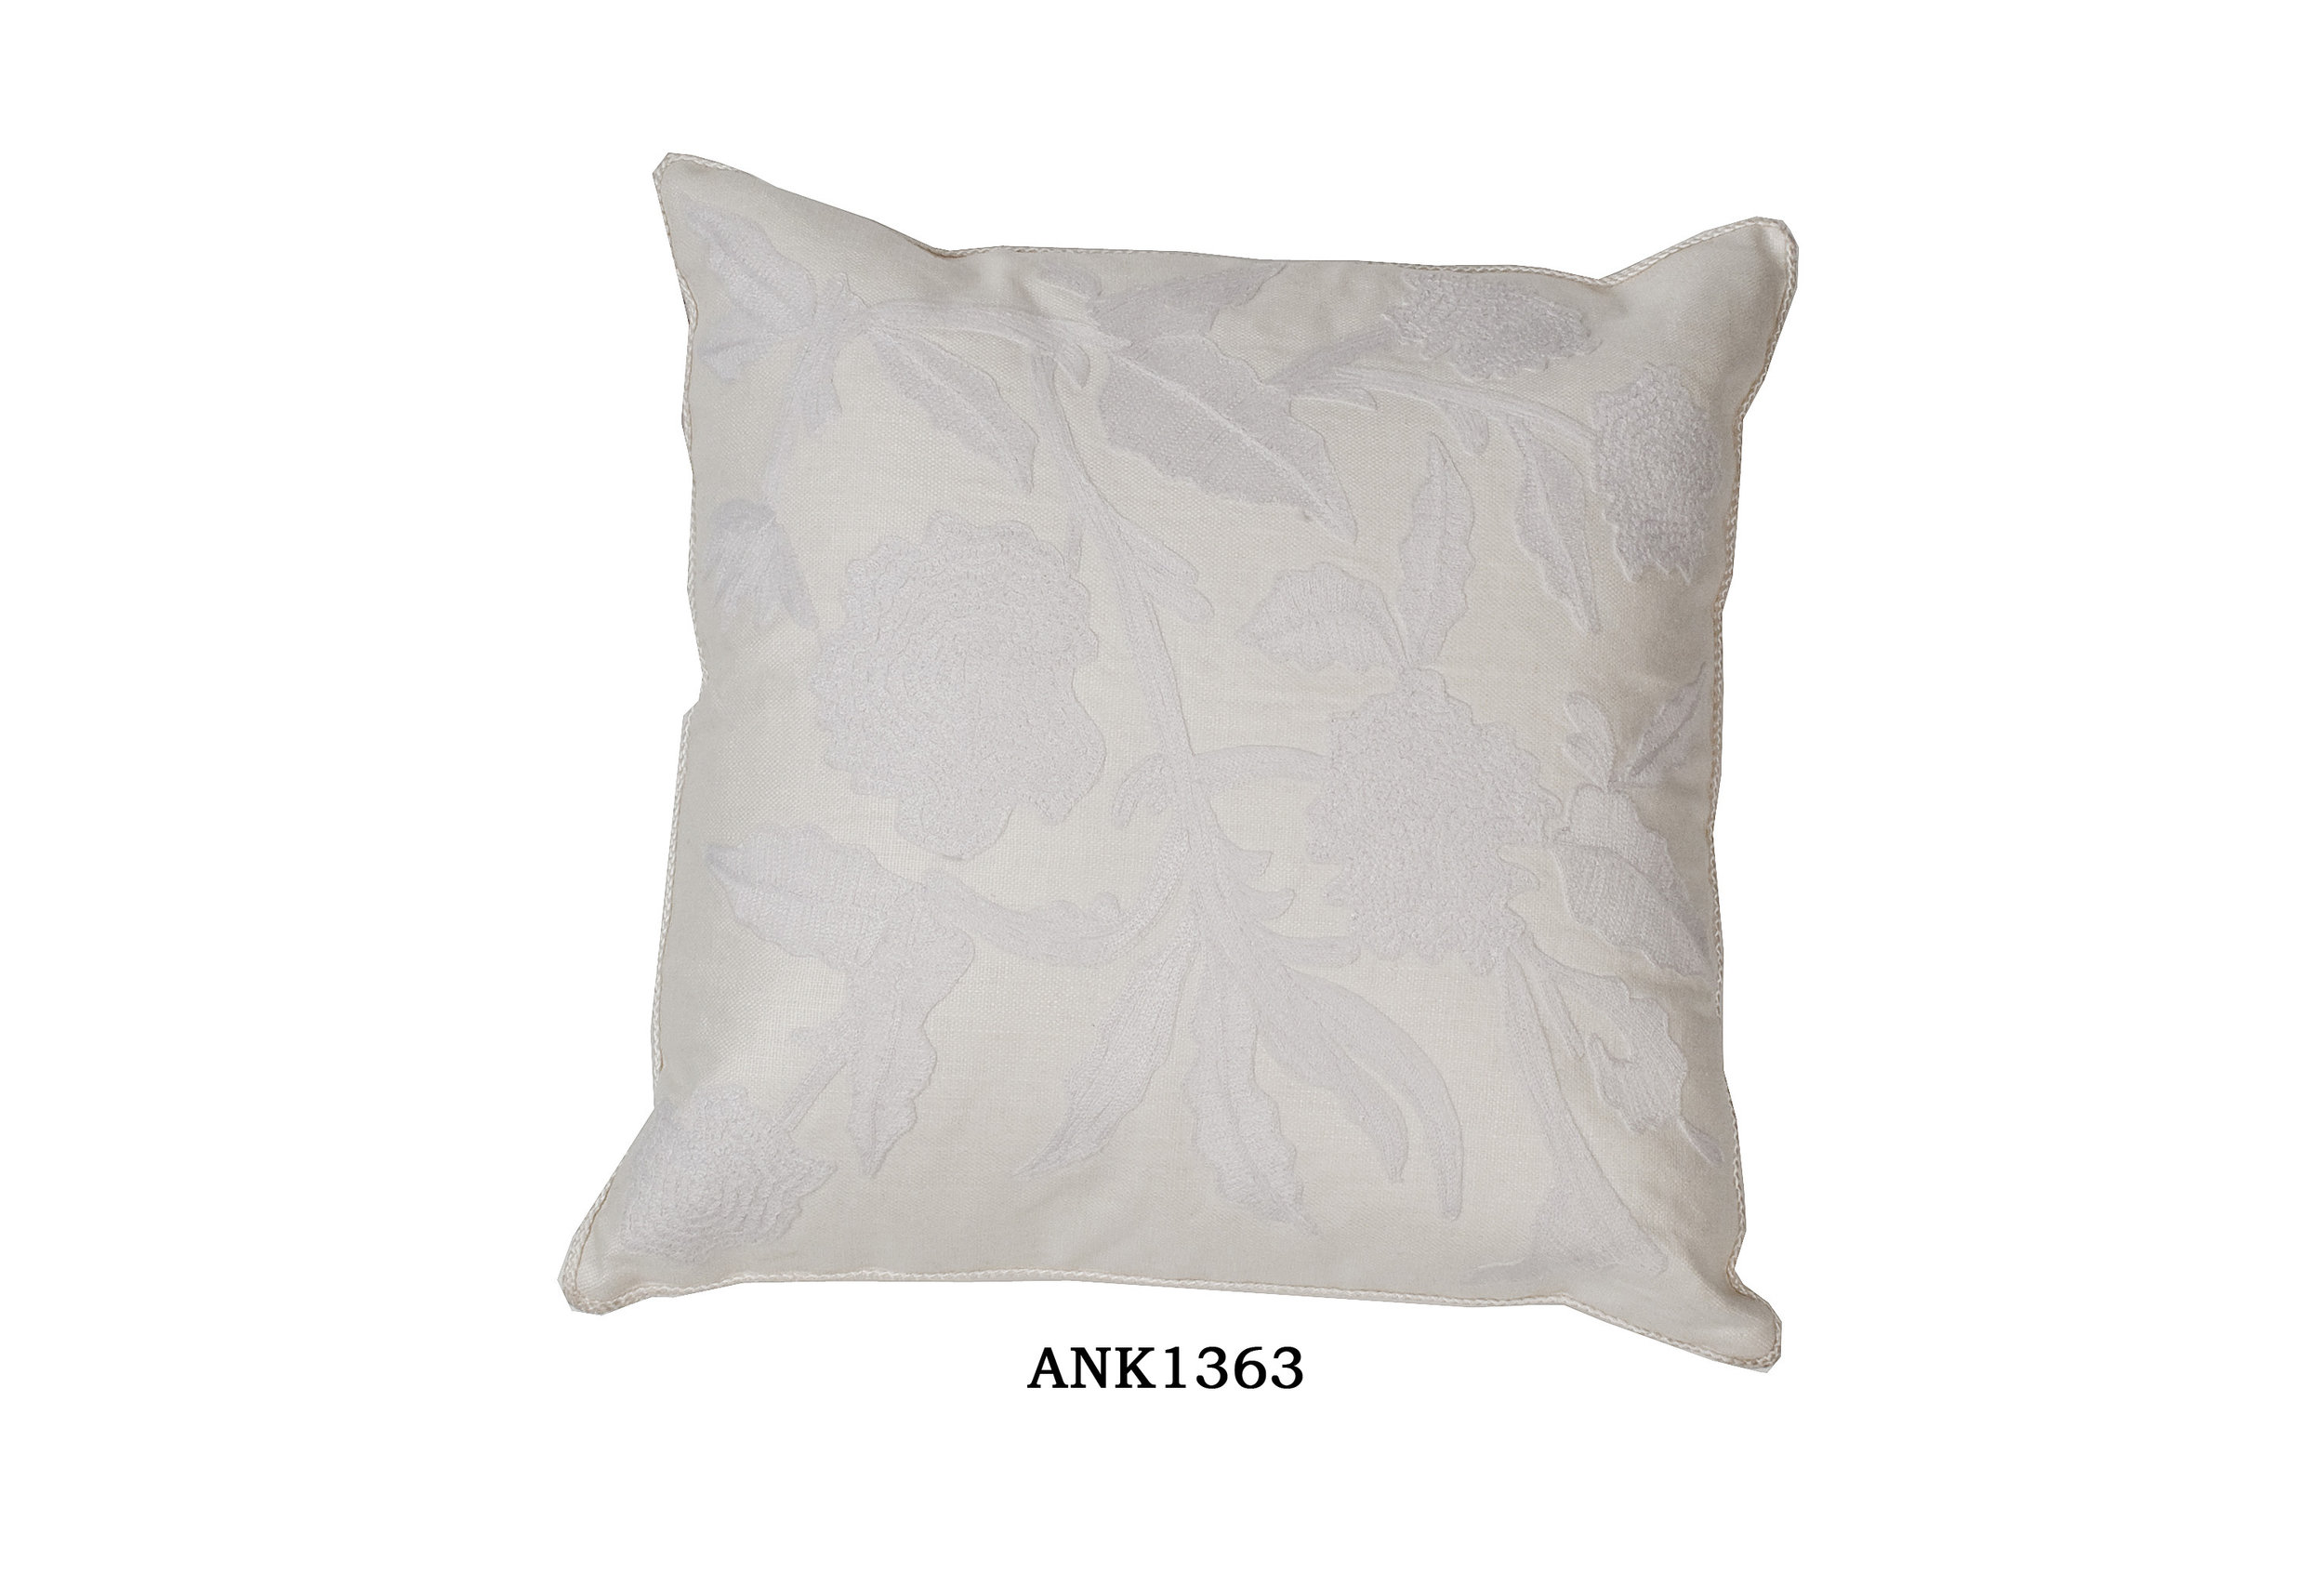 ank1363 copy.jpg